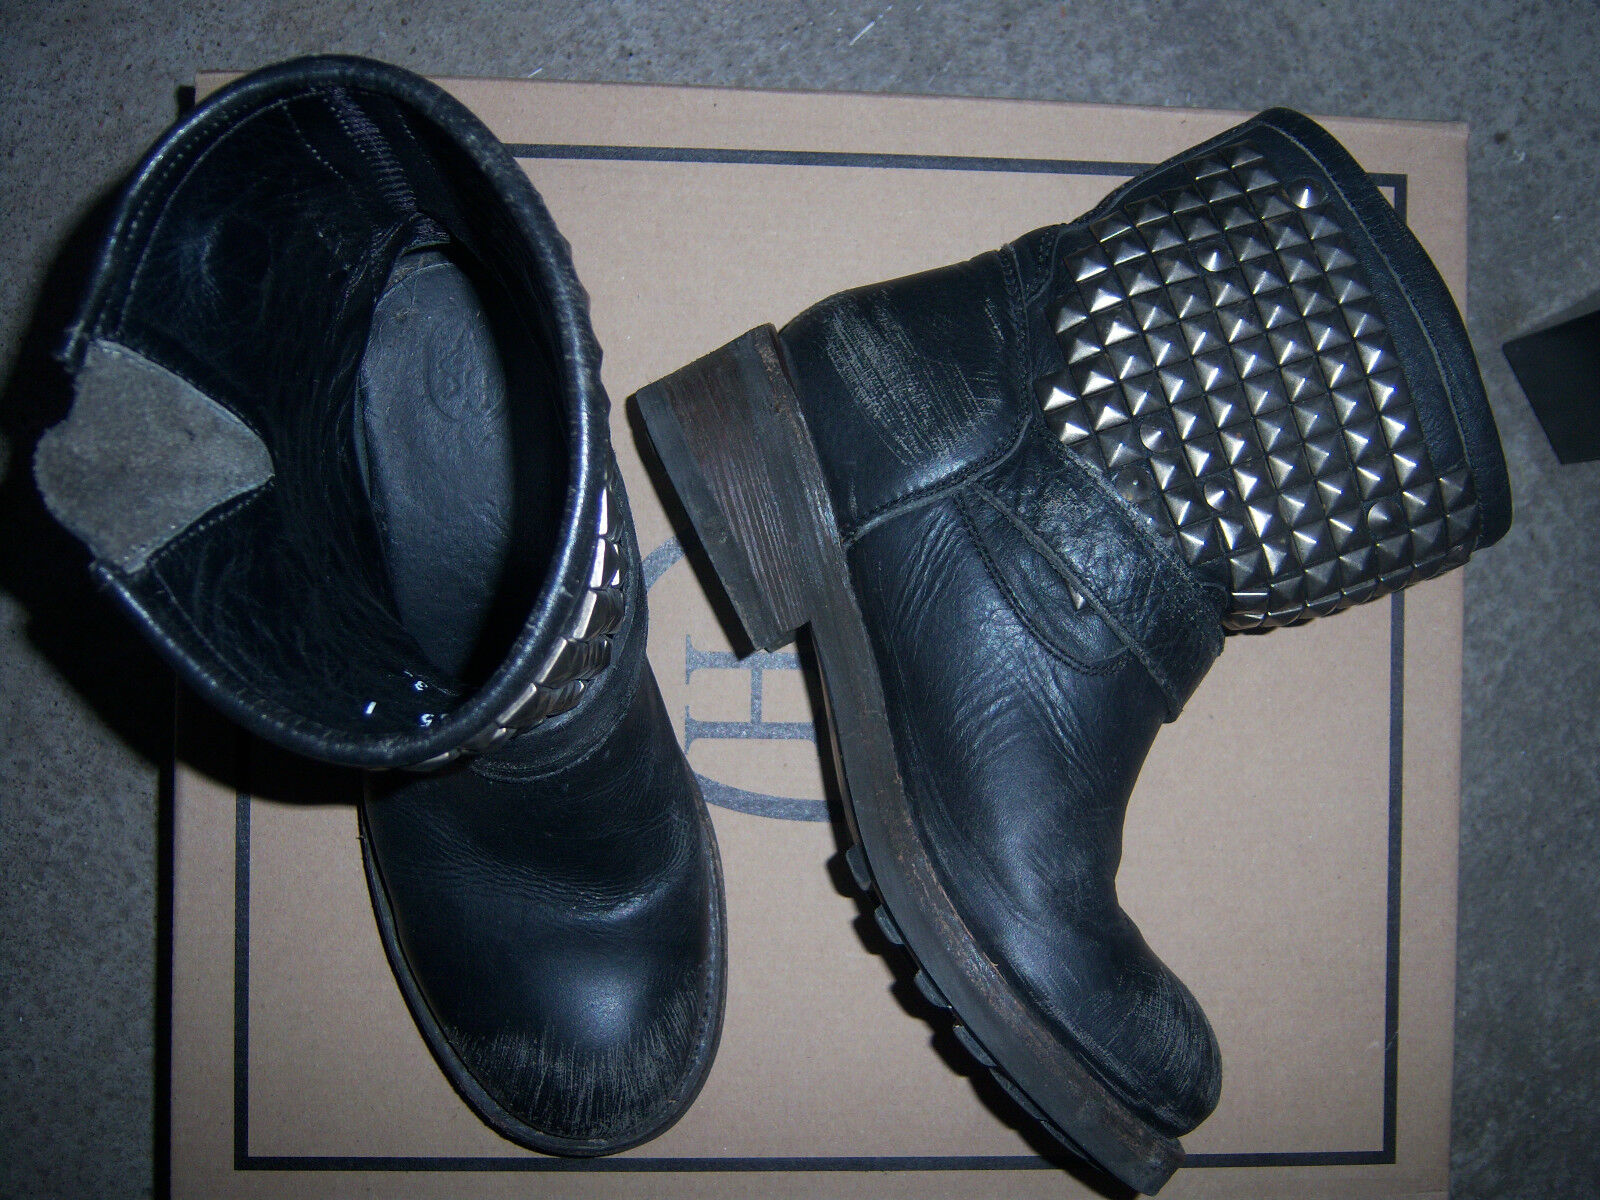 ASH Bottines TITAN Cuir negro 36 TBE ASH mujer TITAN TITAN mujer botas negro US 5, UK 3,5 1f192a